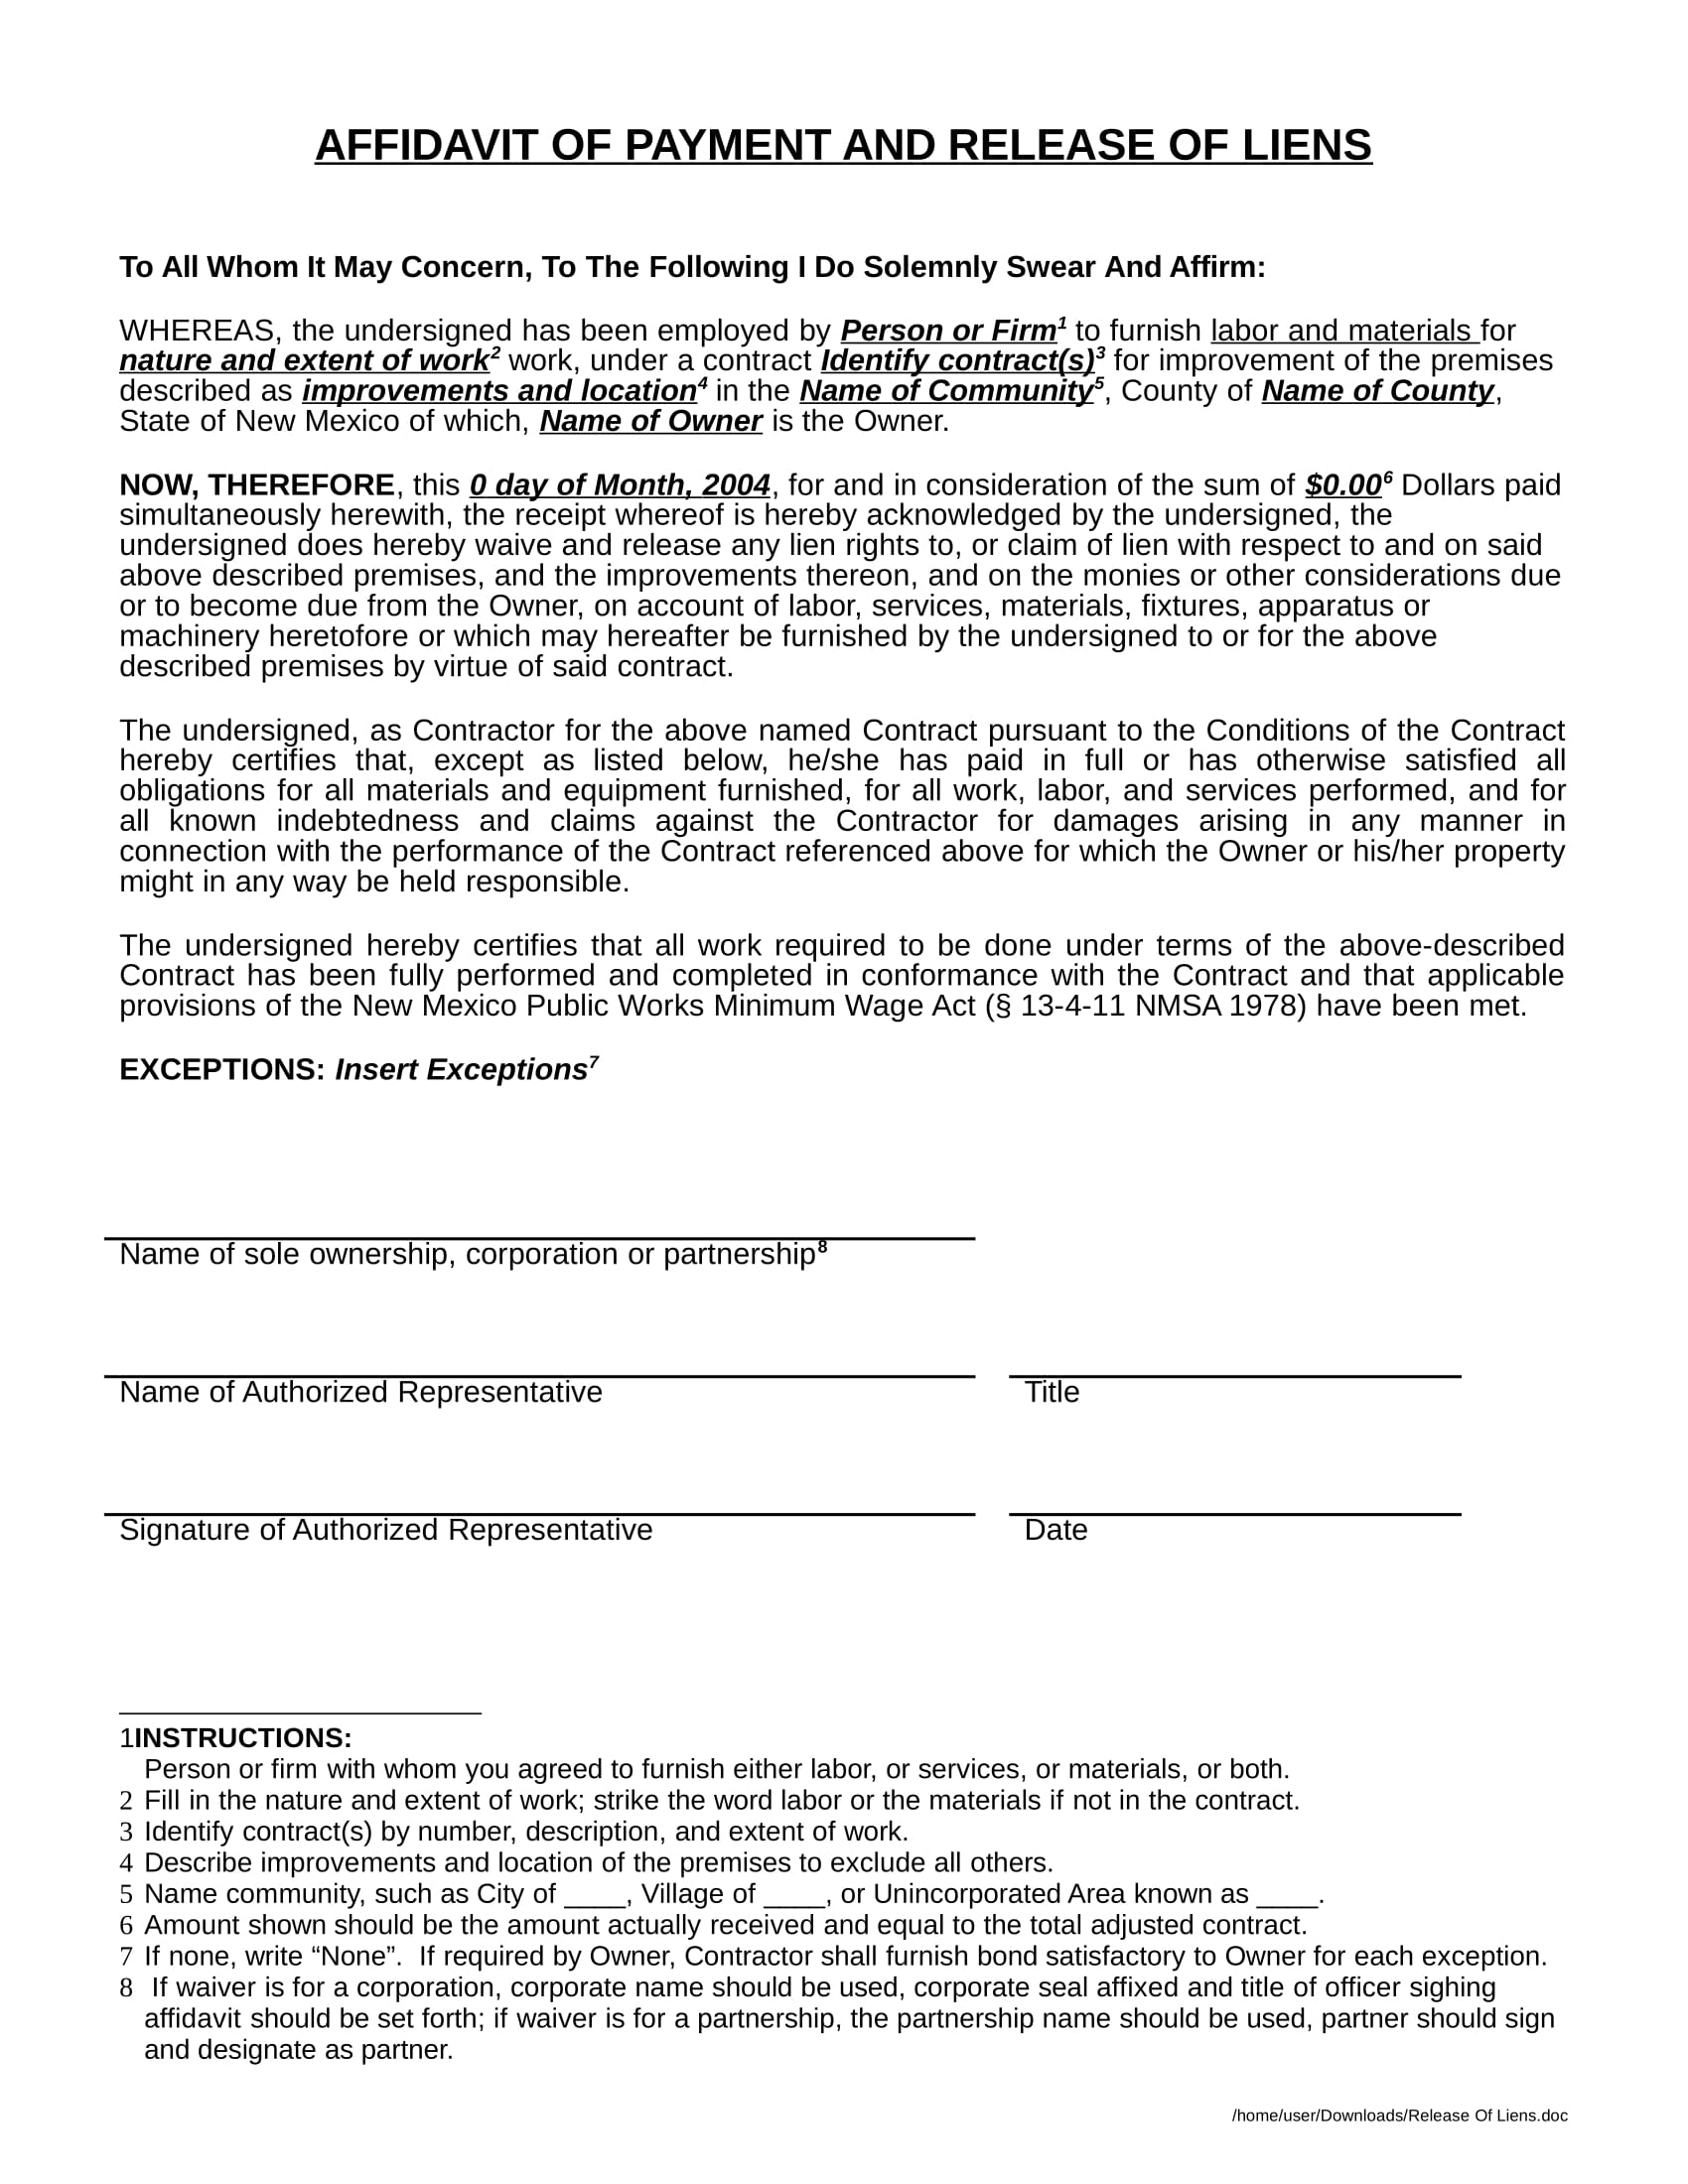 affidavit of payment form sample 1